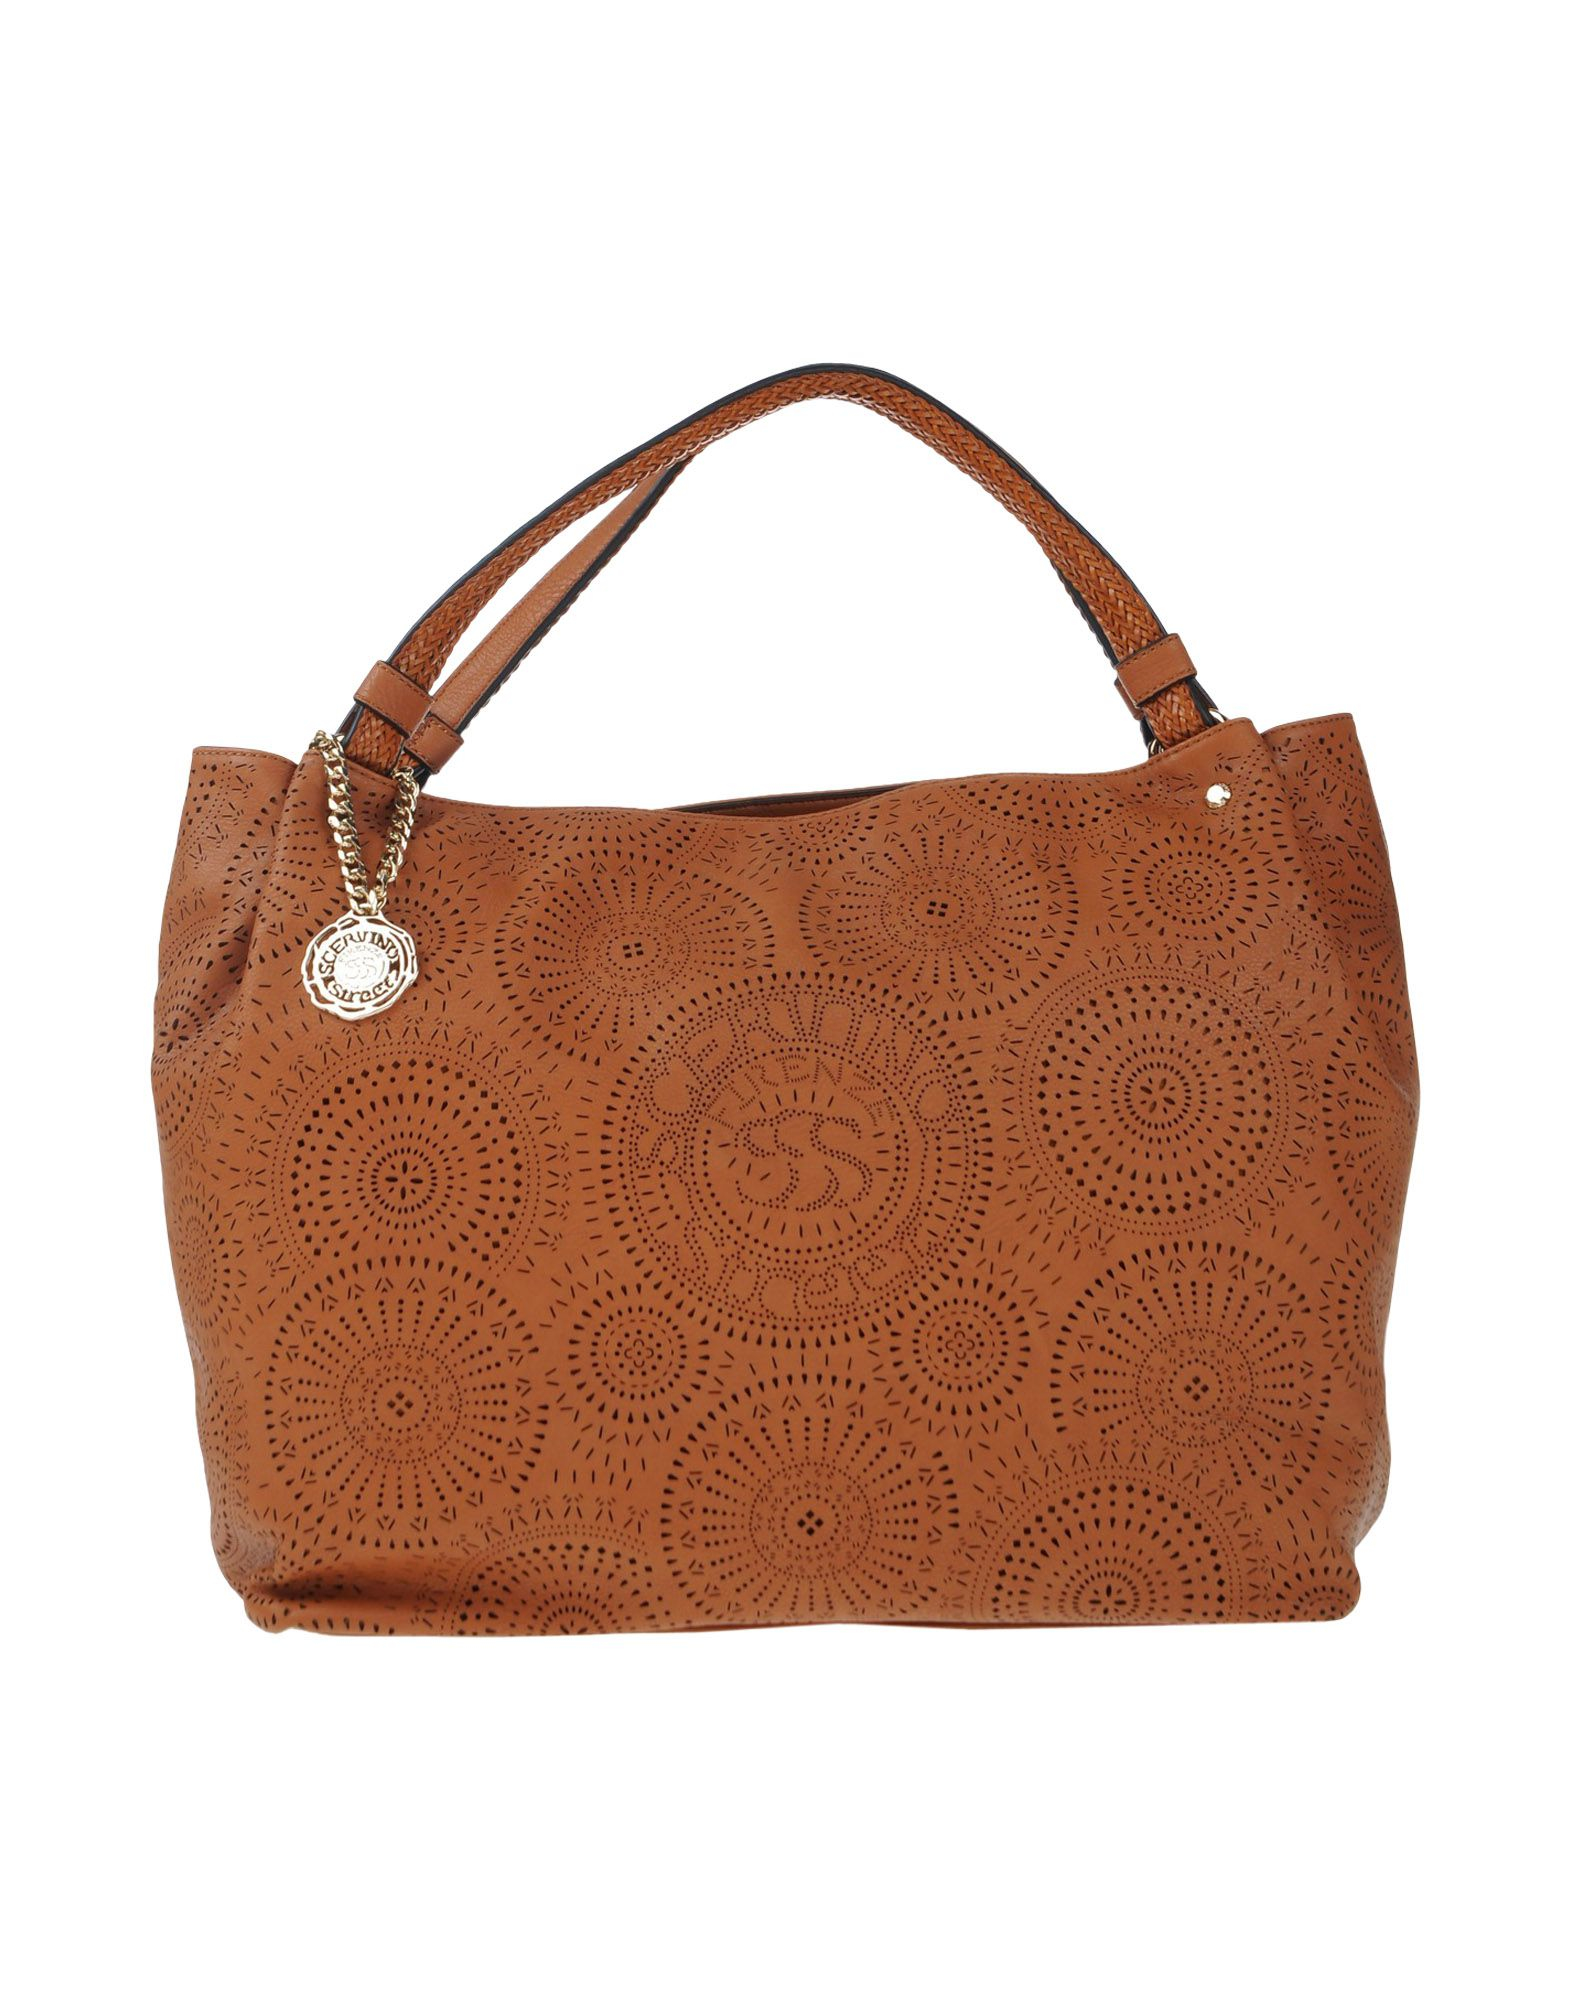 Ermanno scervino Handbag in Brown